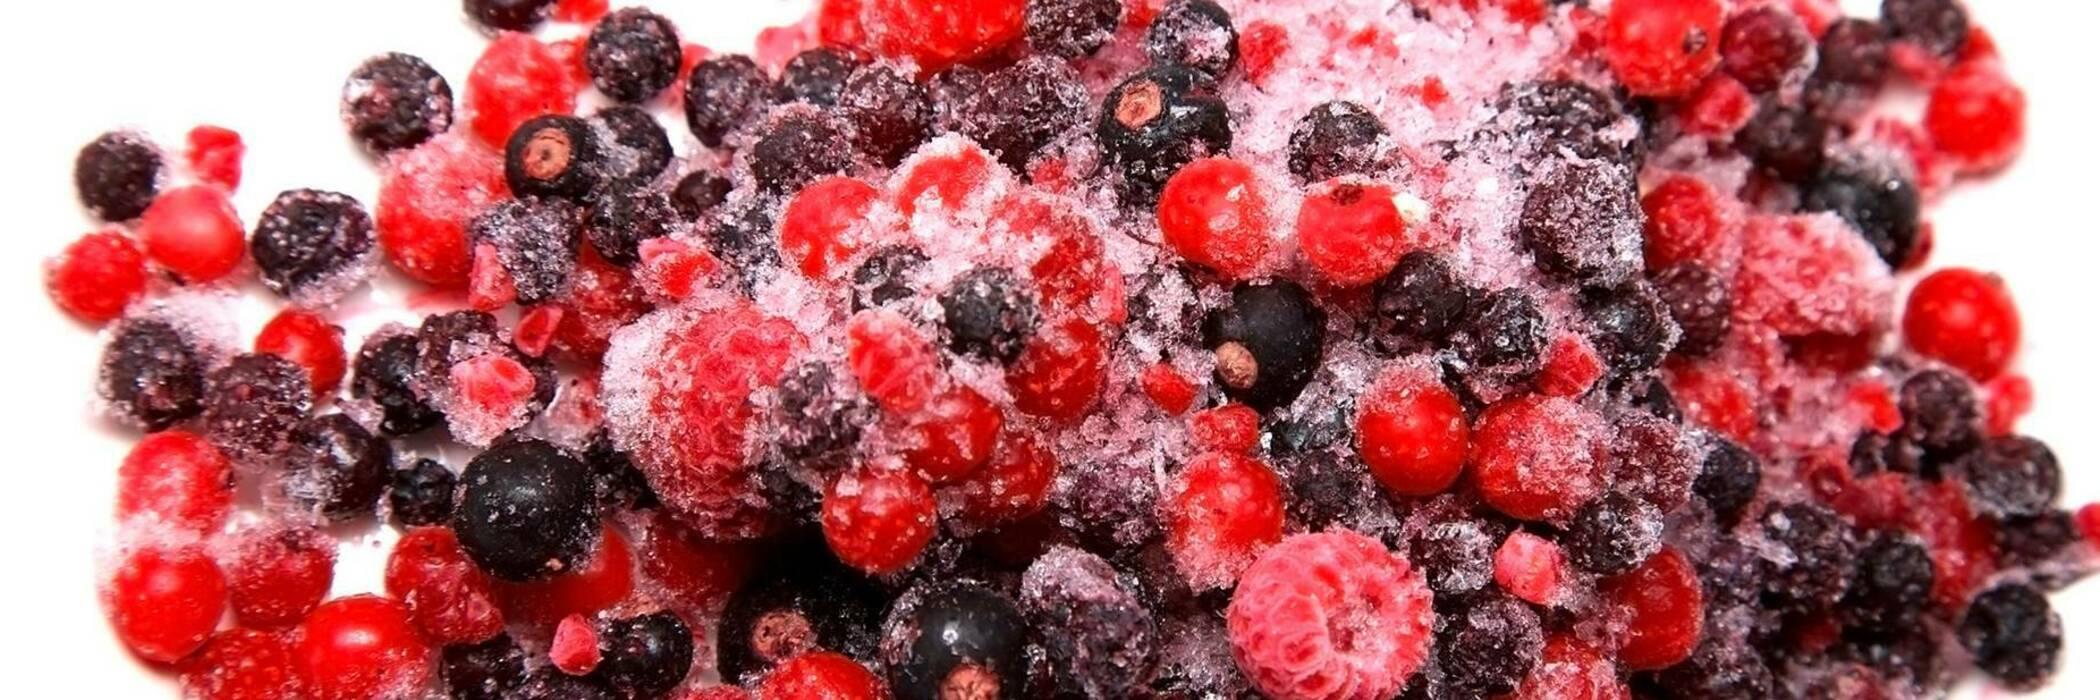 Berries hero